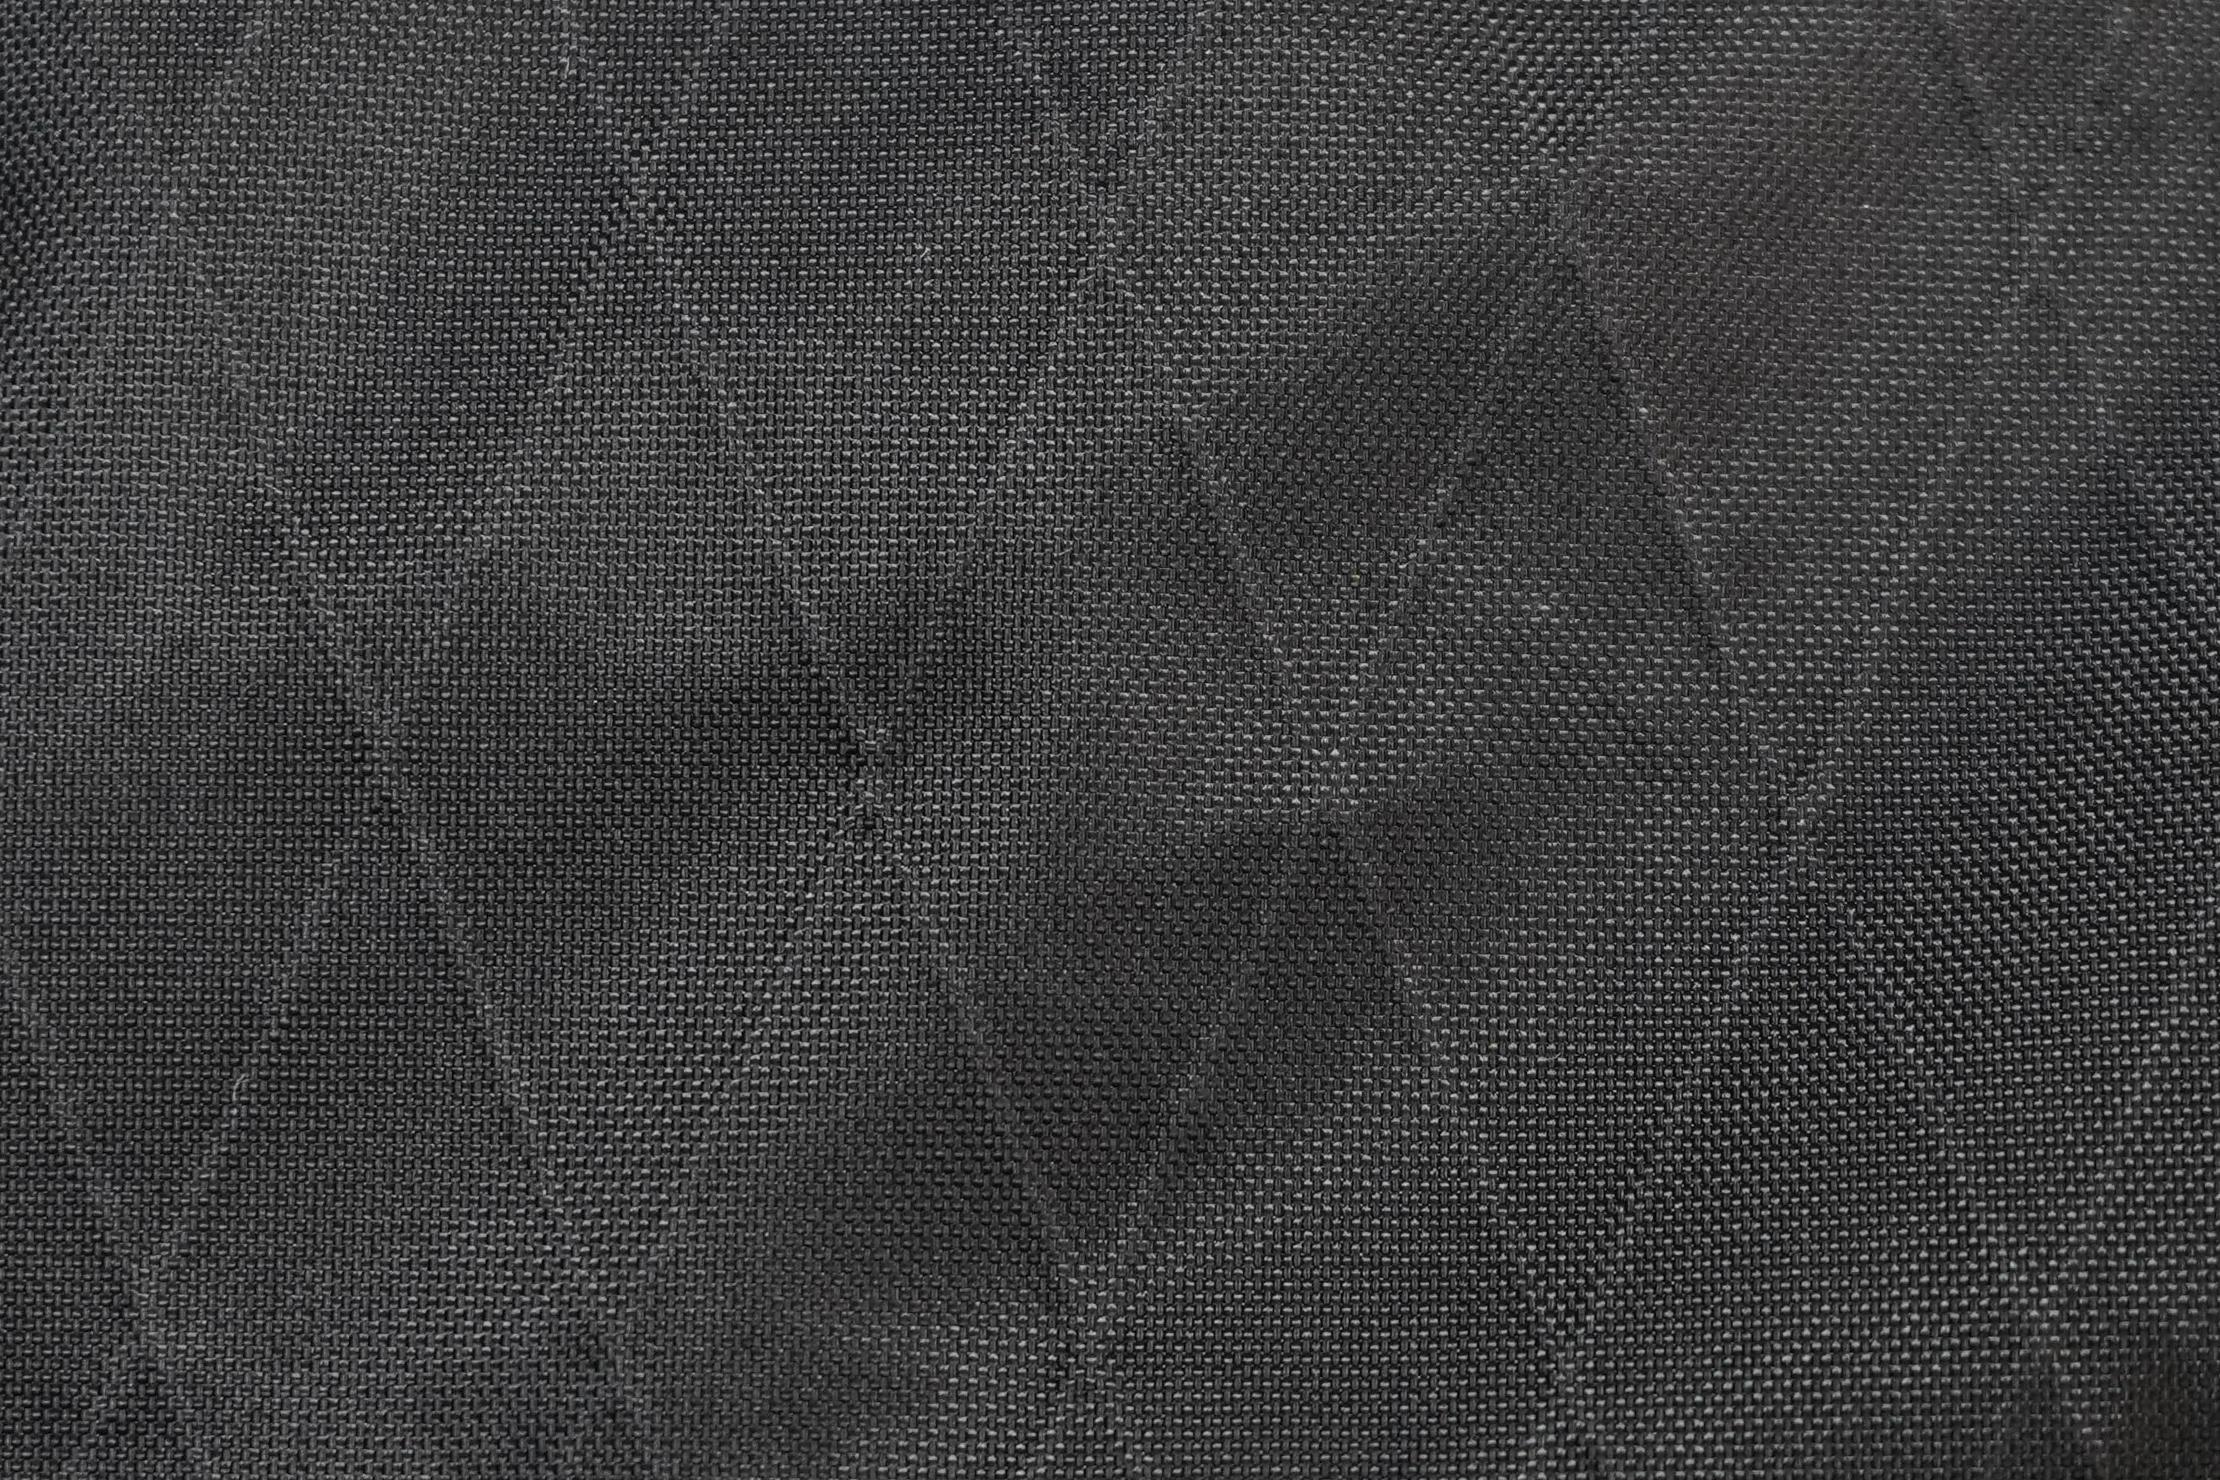 Tortuga Outbreaker Laptop Backpack Material